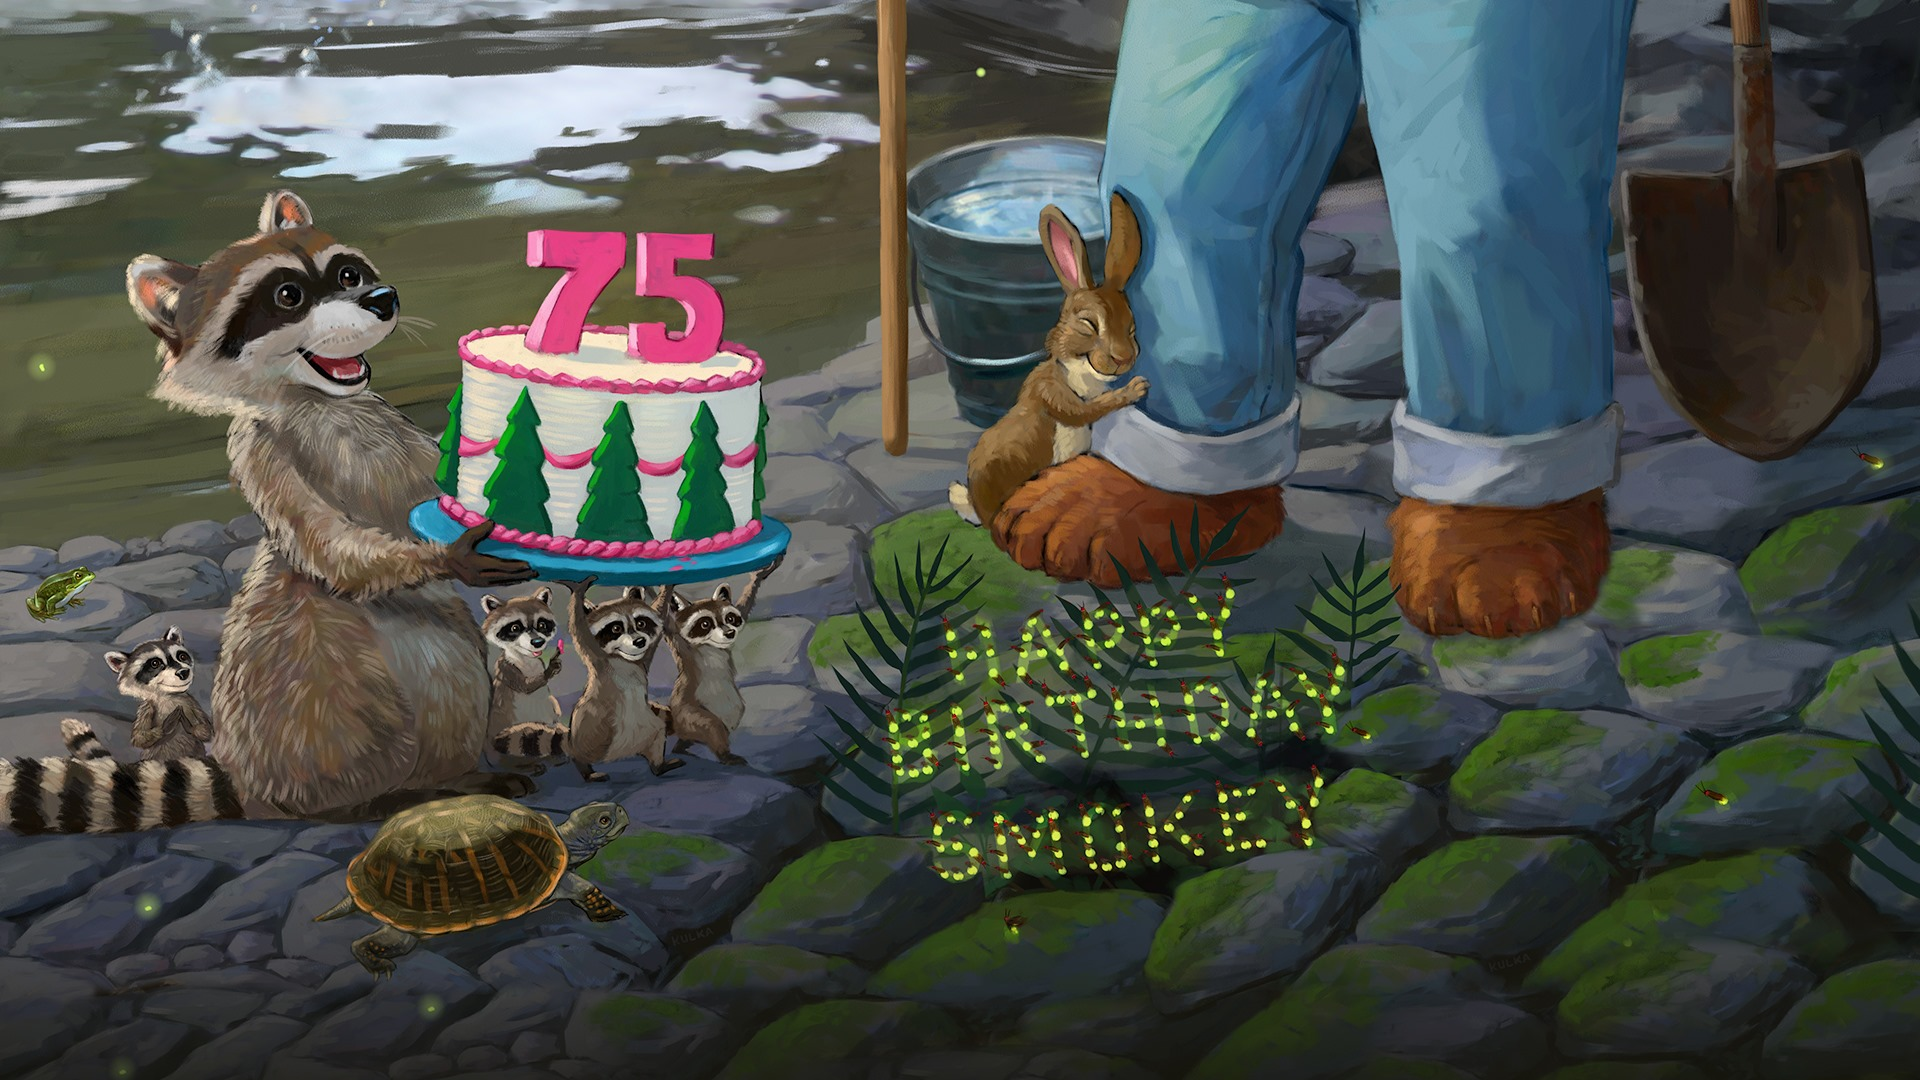 Happy Birthday Smokey (Image:  Smokey Bear Facebook )